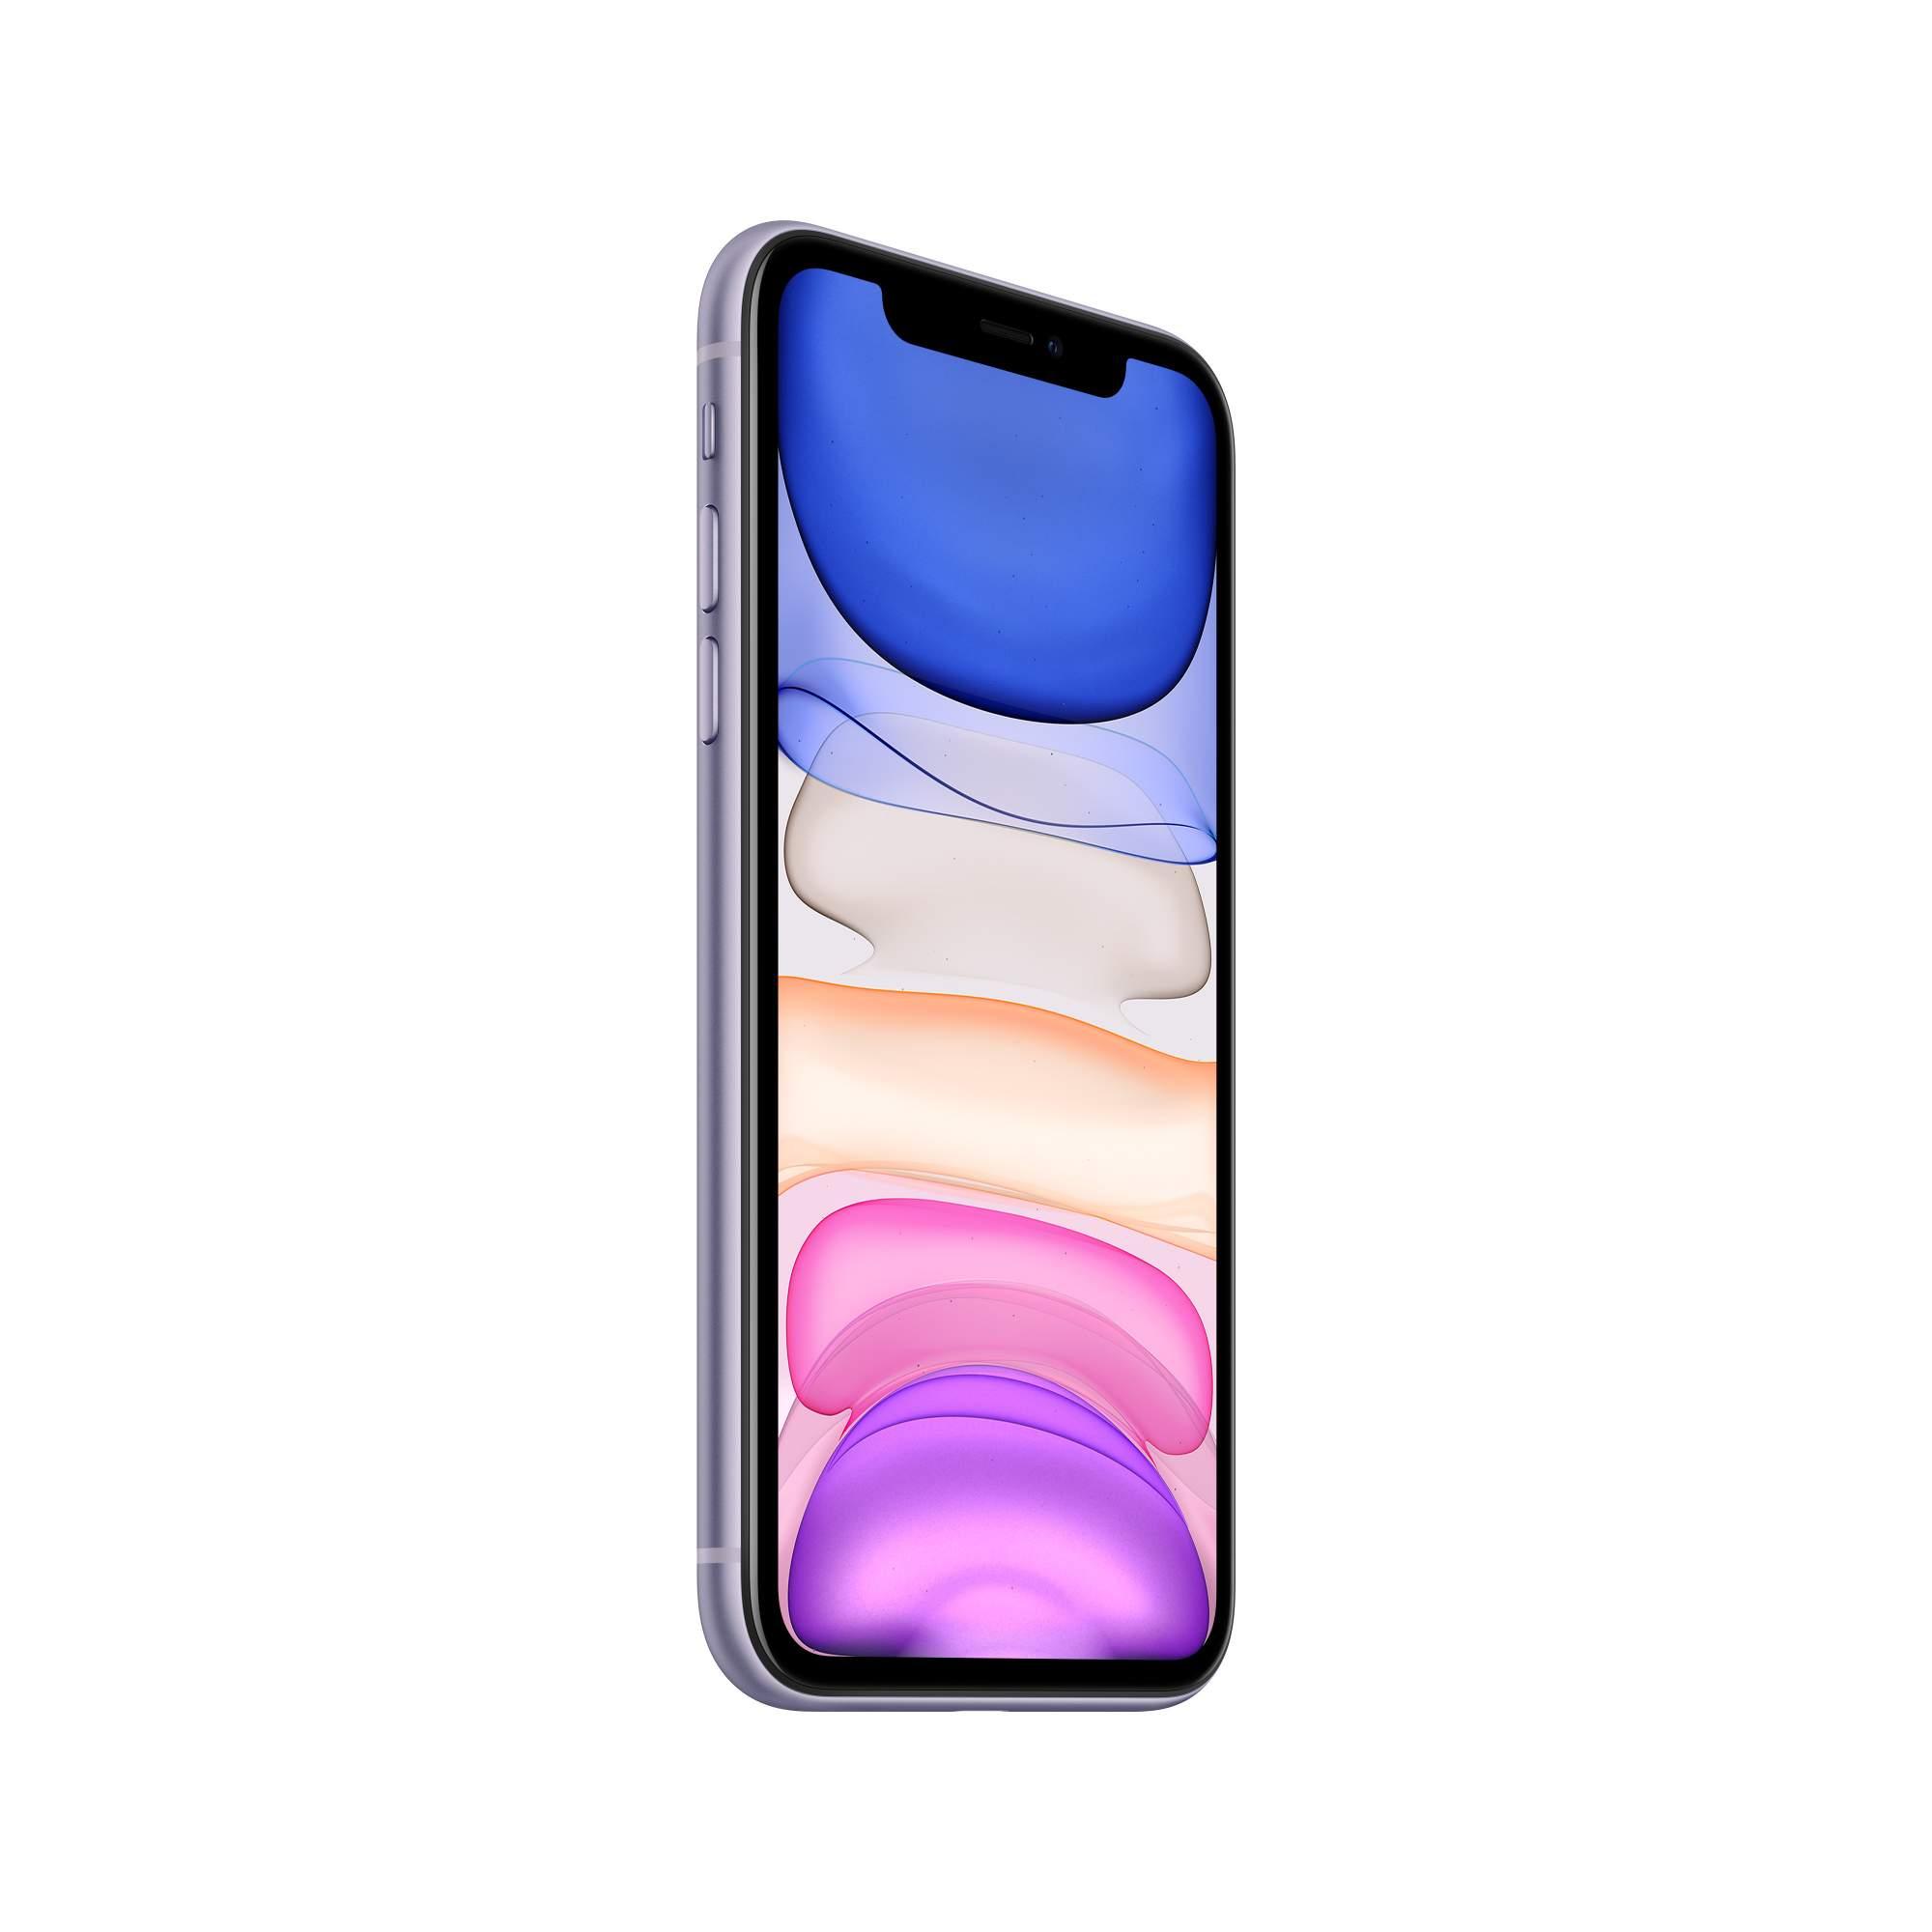 Смартфон Apple iPhone 11 64GB Purple (MWLX2RU/A)